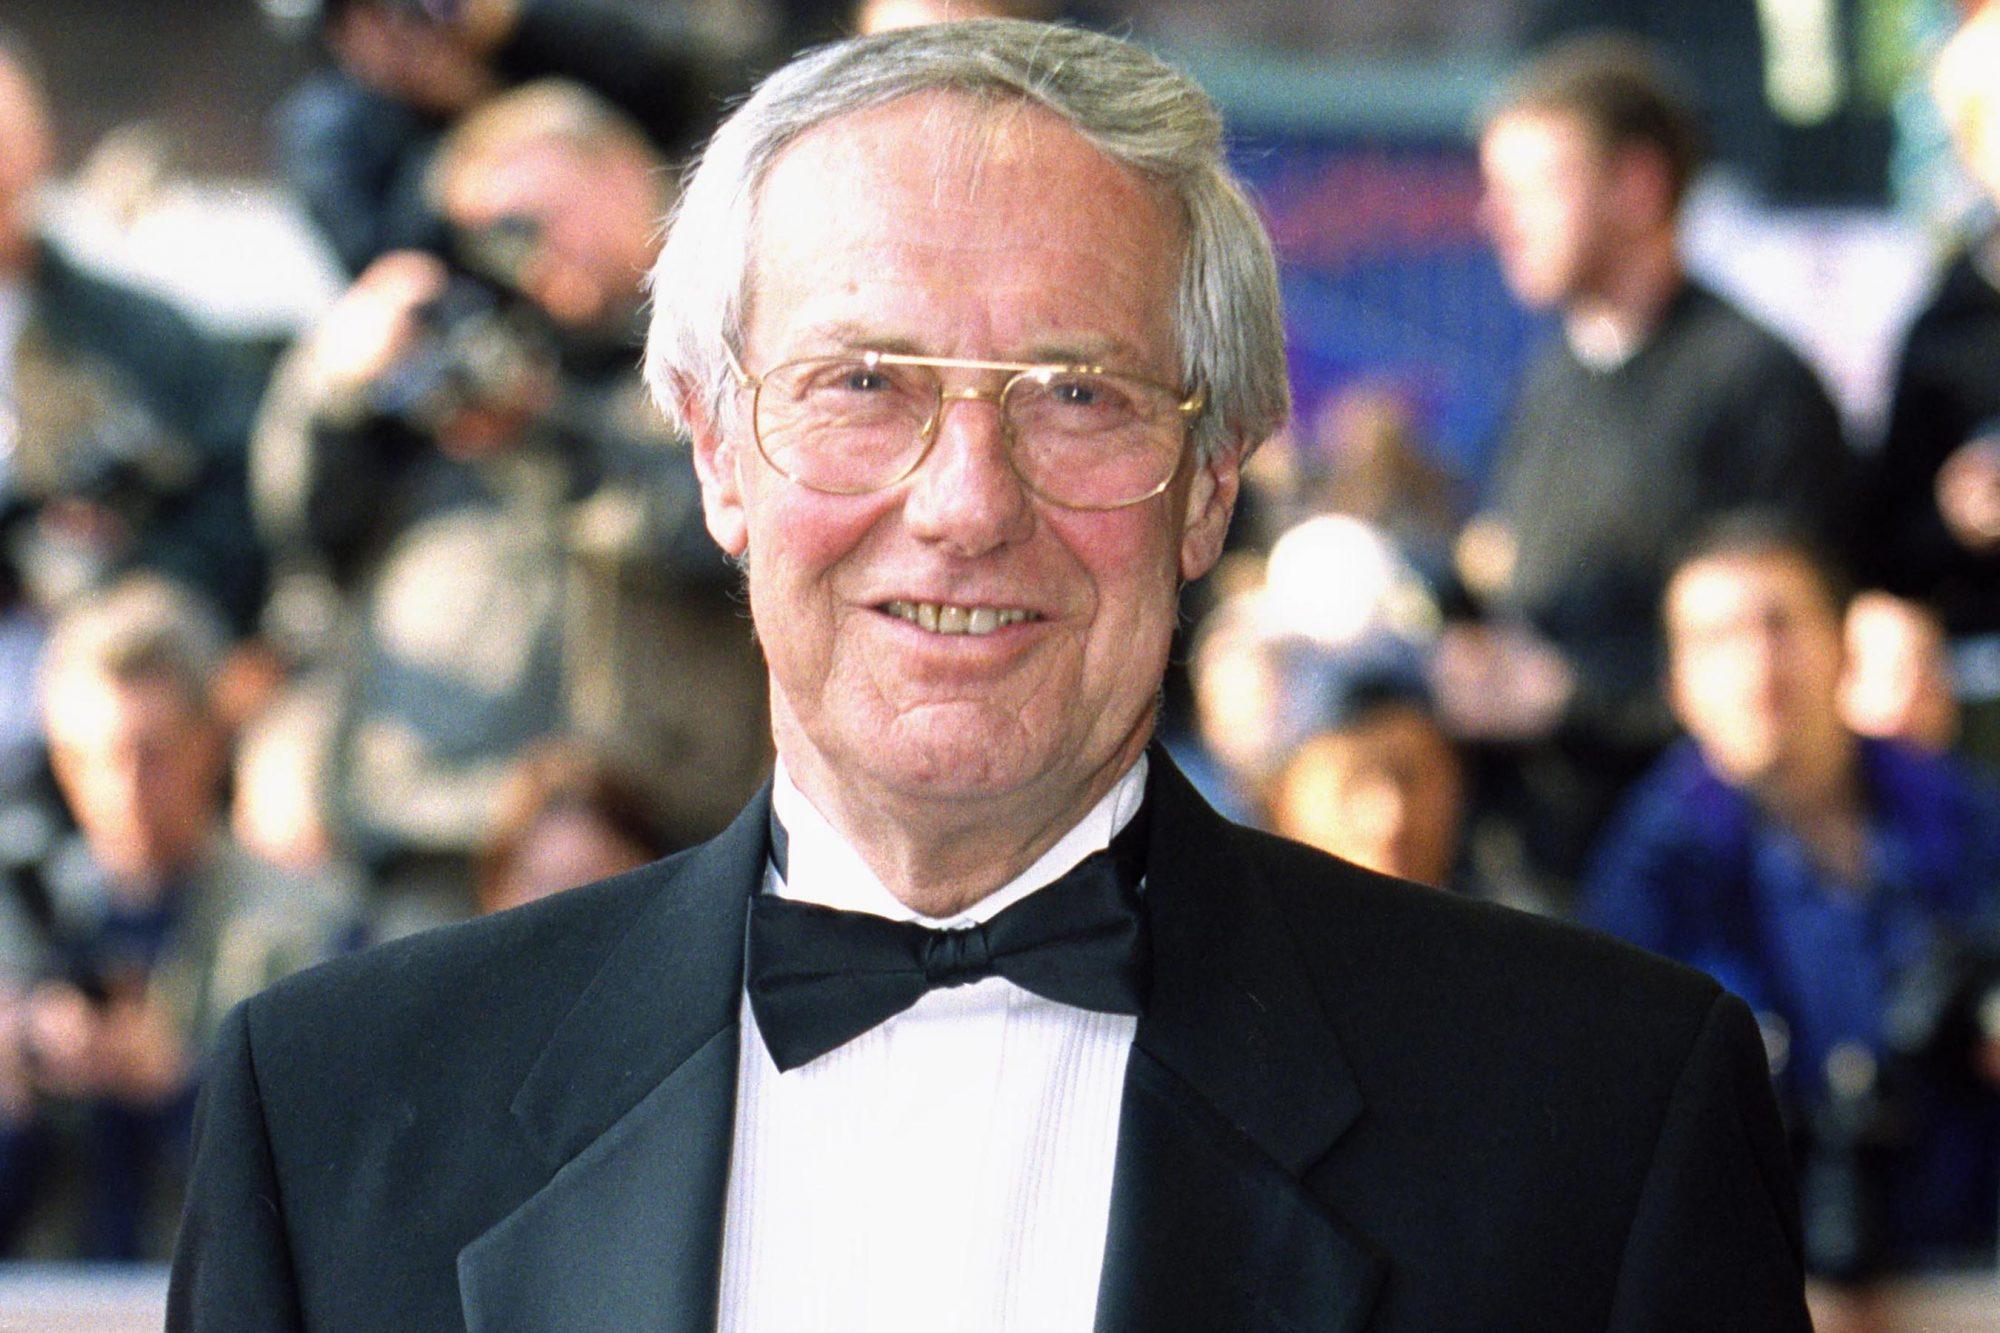 The 2000 Bafta Film Awards